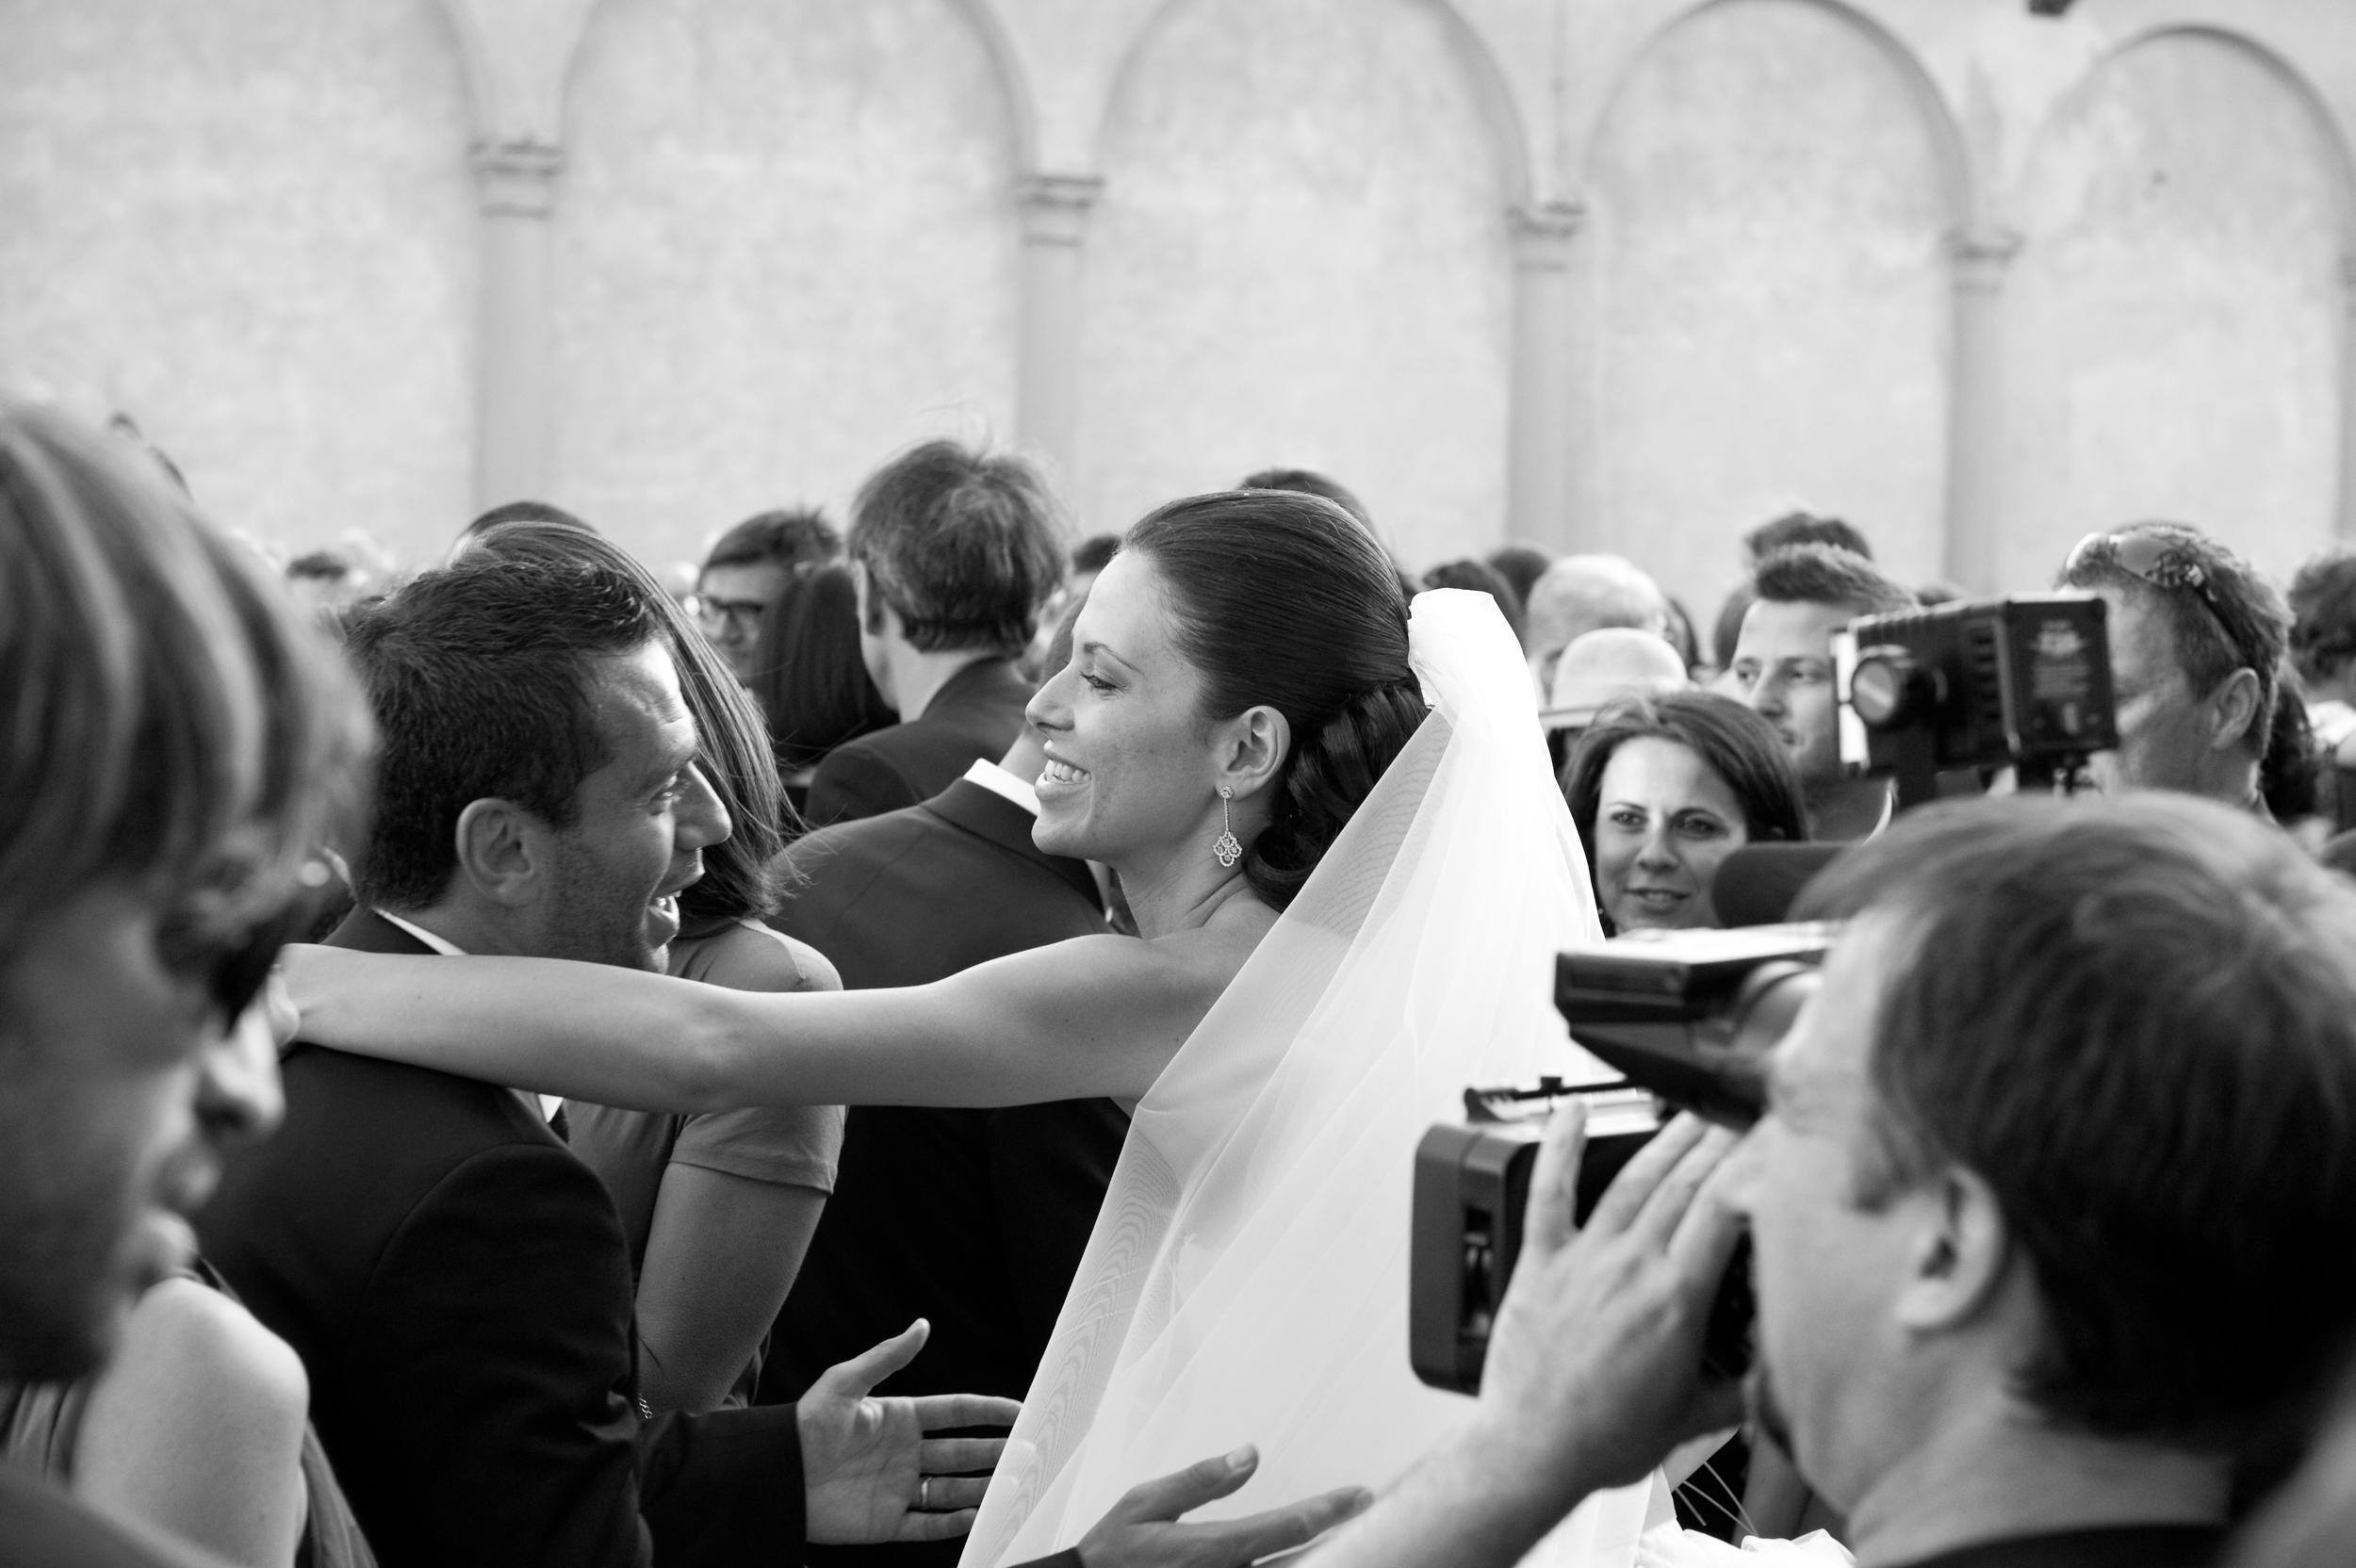 Foto_Bettina_Conradi_Hochzeit19.jpg